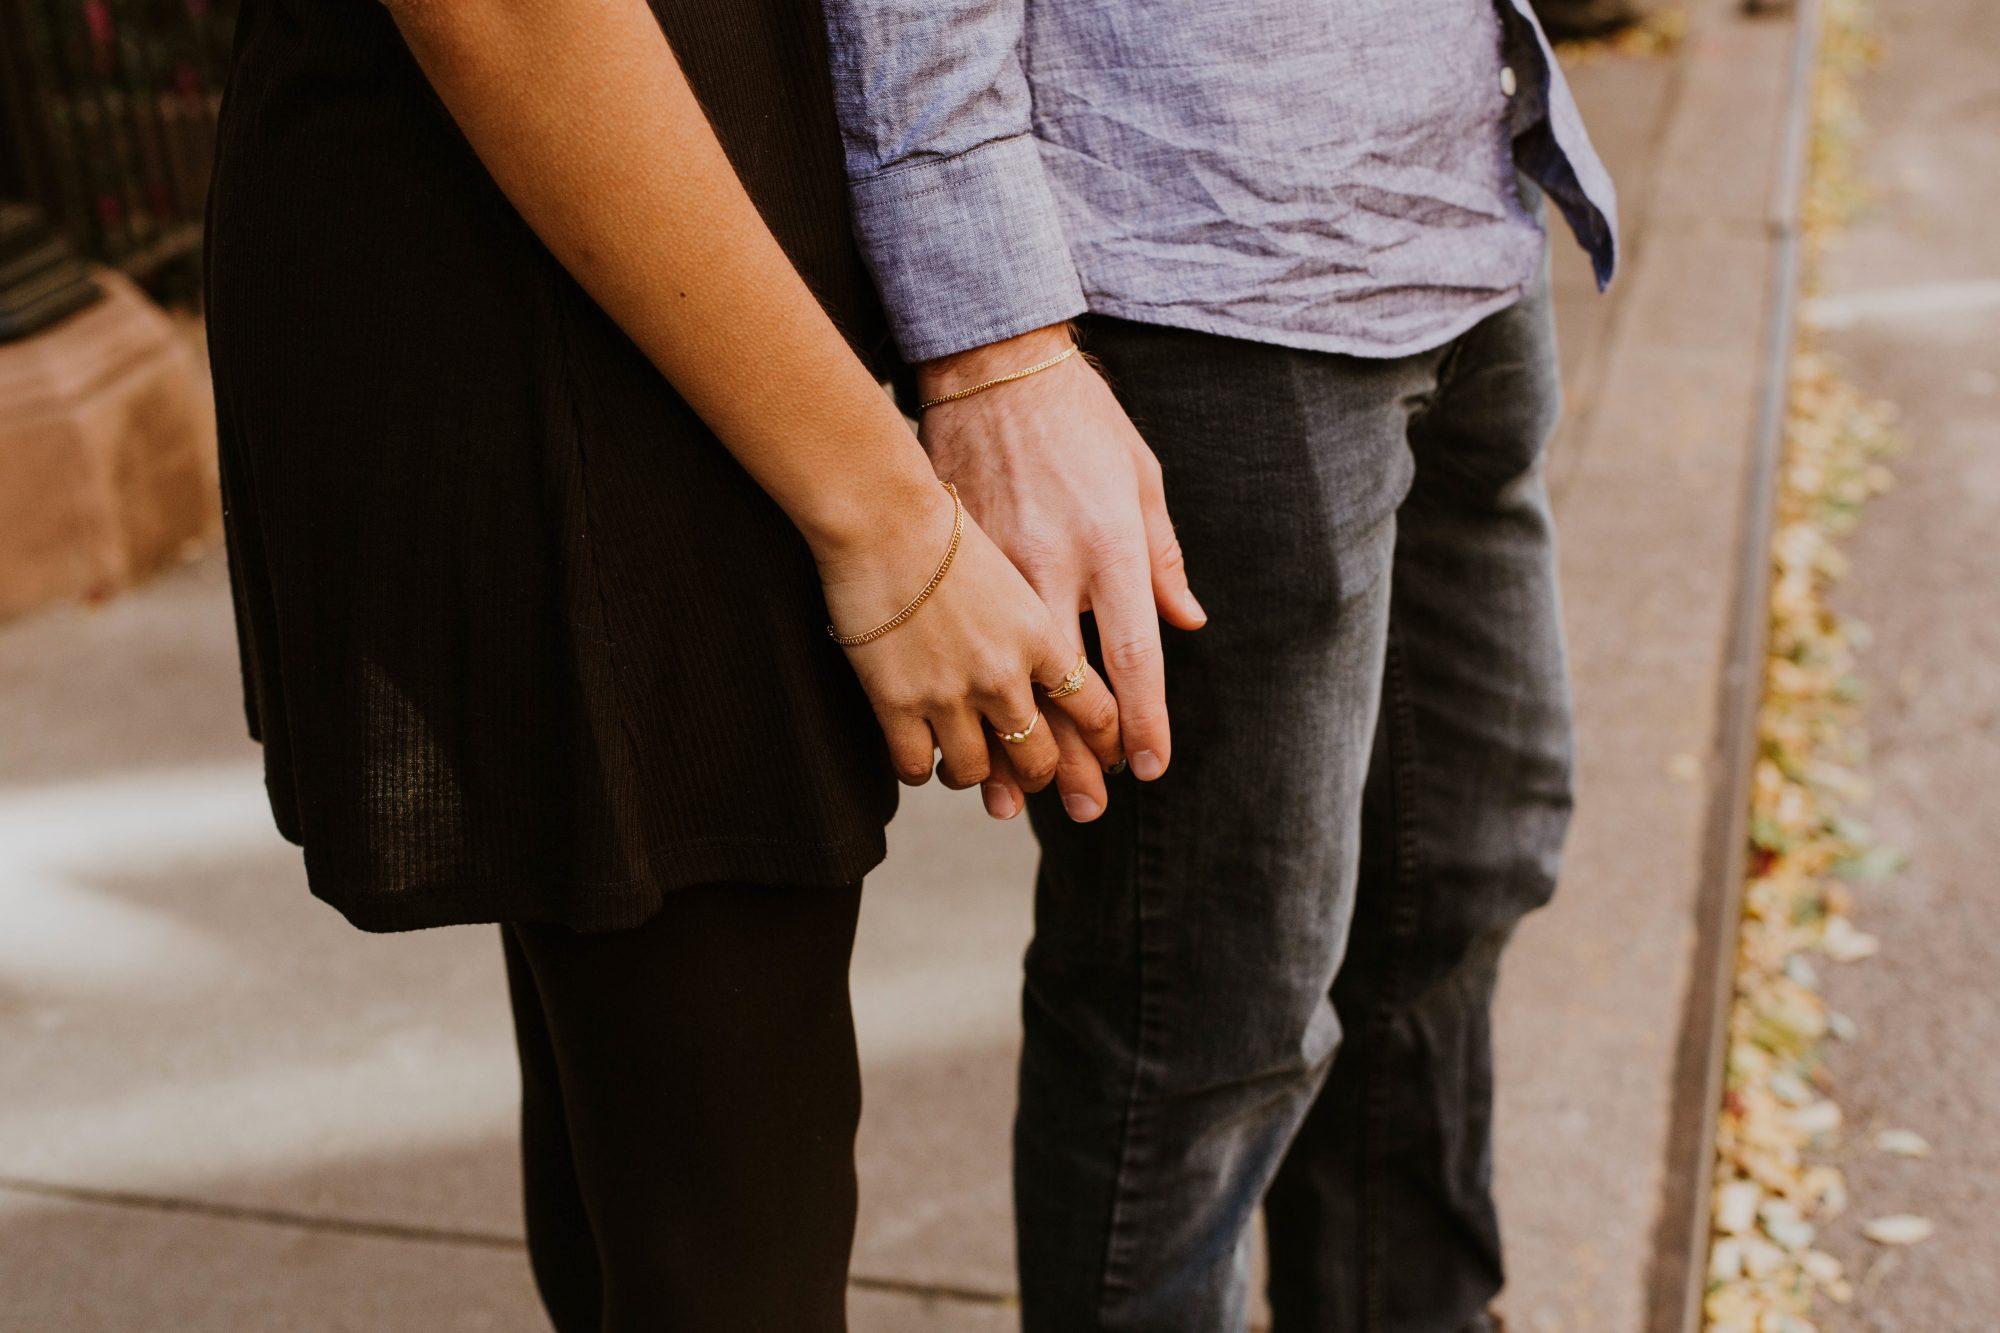 crush holding hands